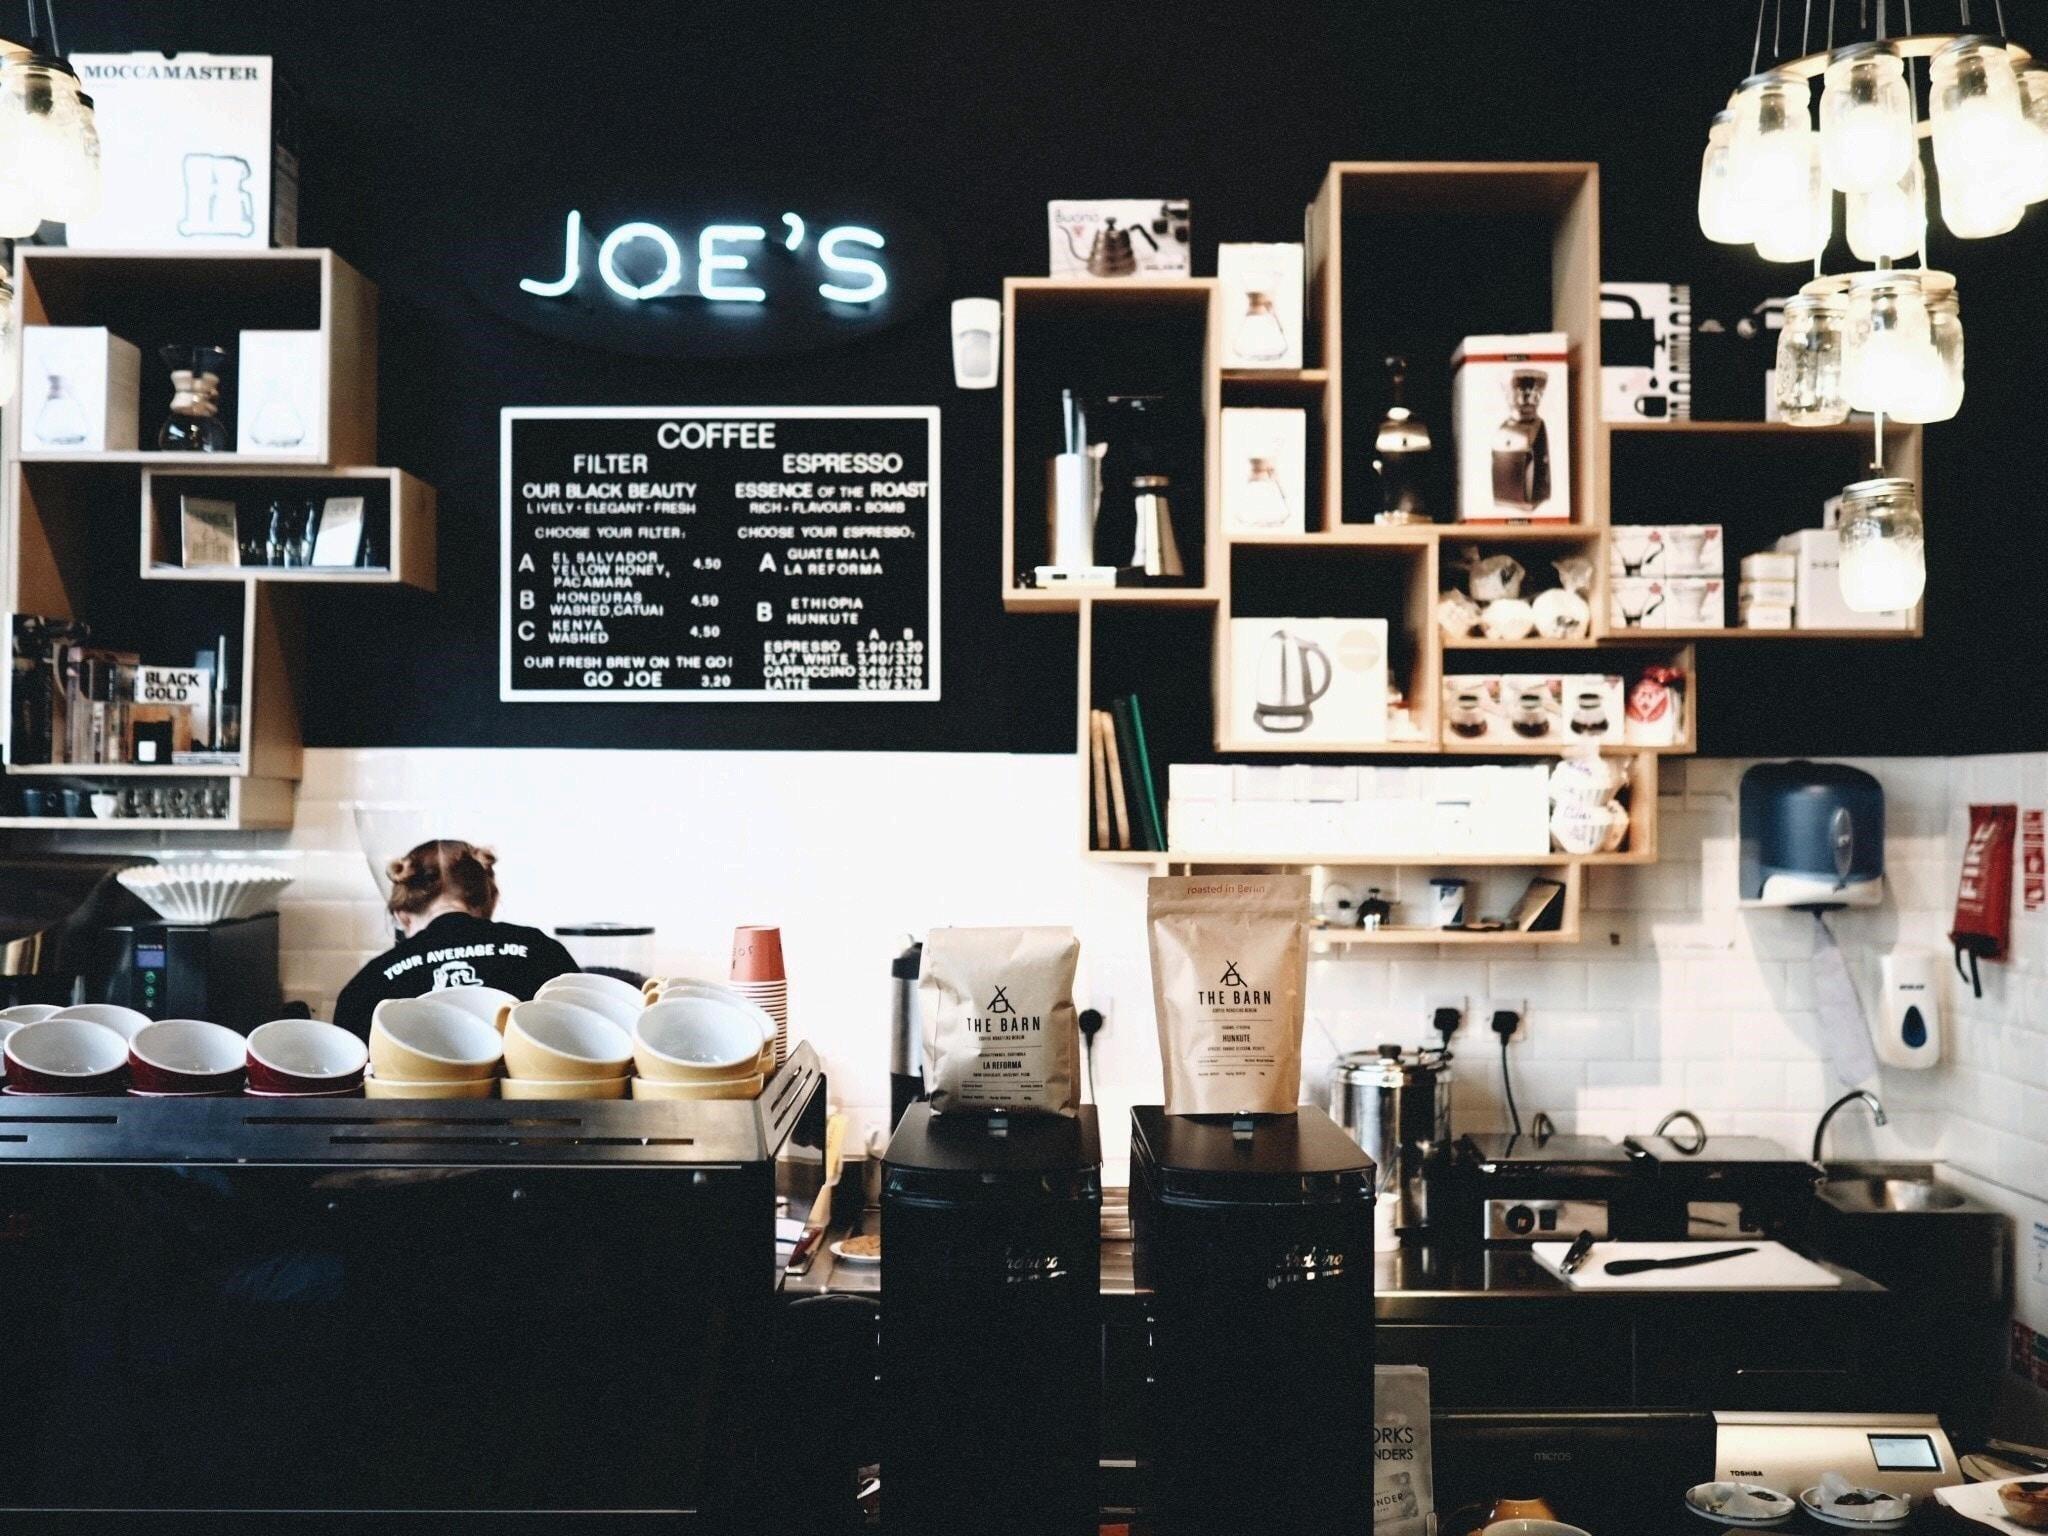 a barista behind the coffee bar